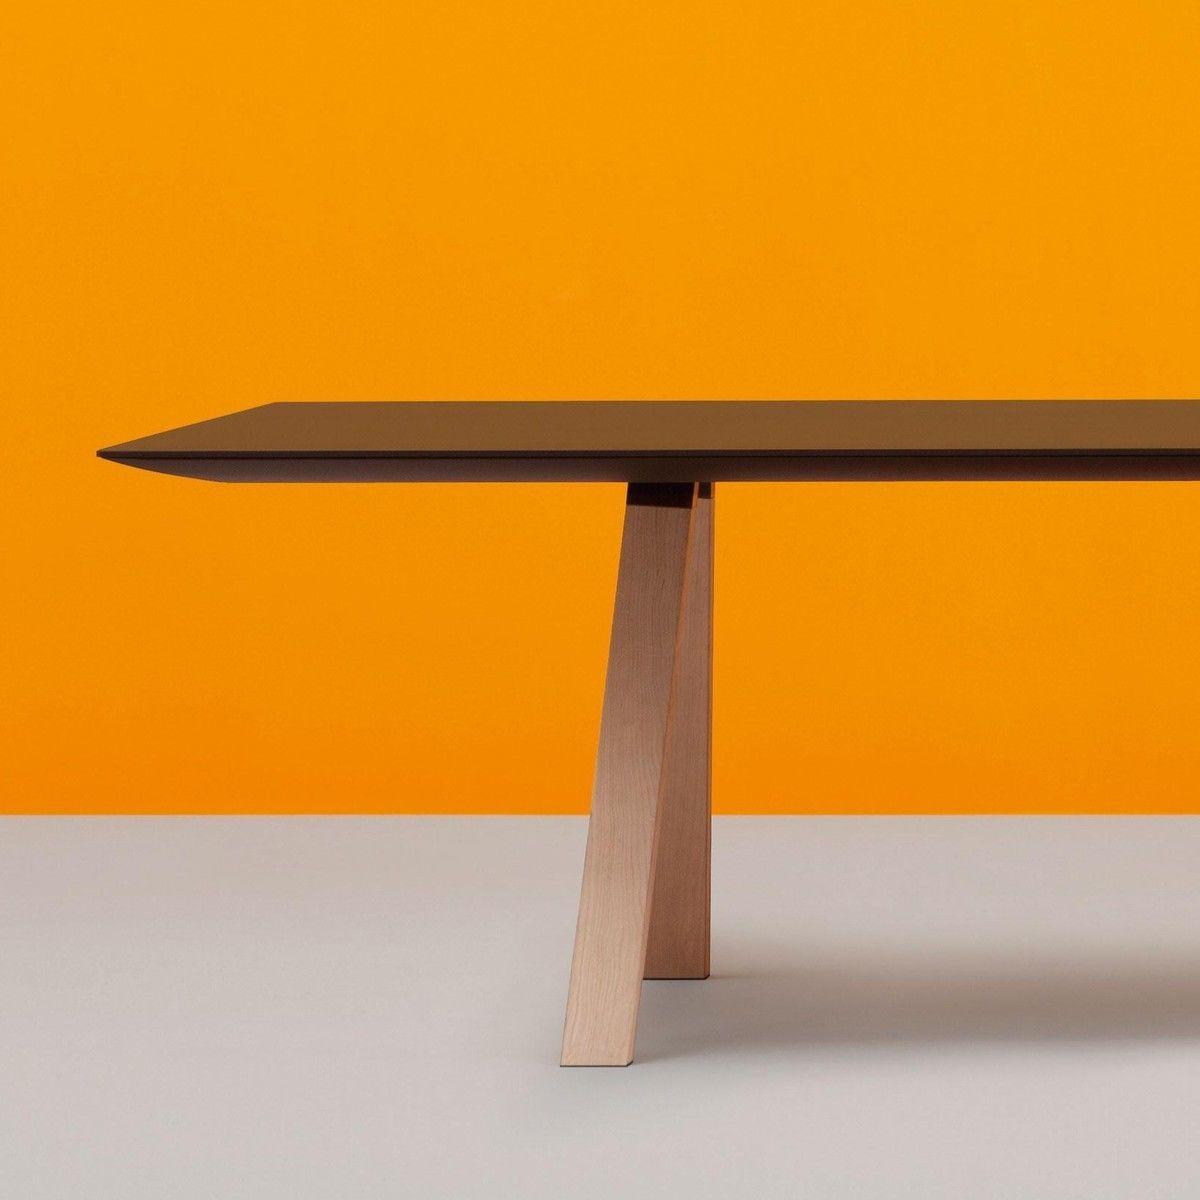 arki table wood dining table 300x100cm pedrali. Black Bedroom Furniture Sets. Home Design Ideas